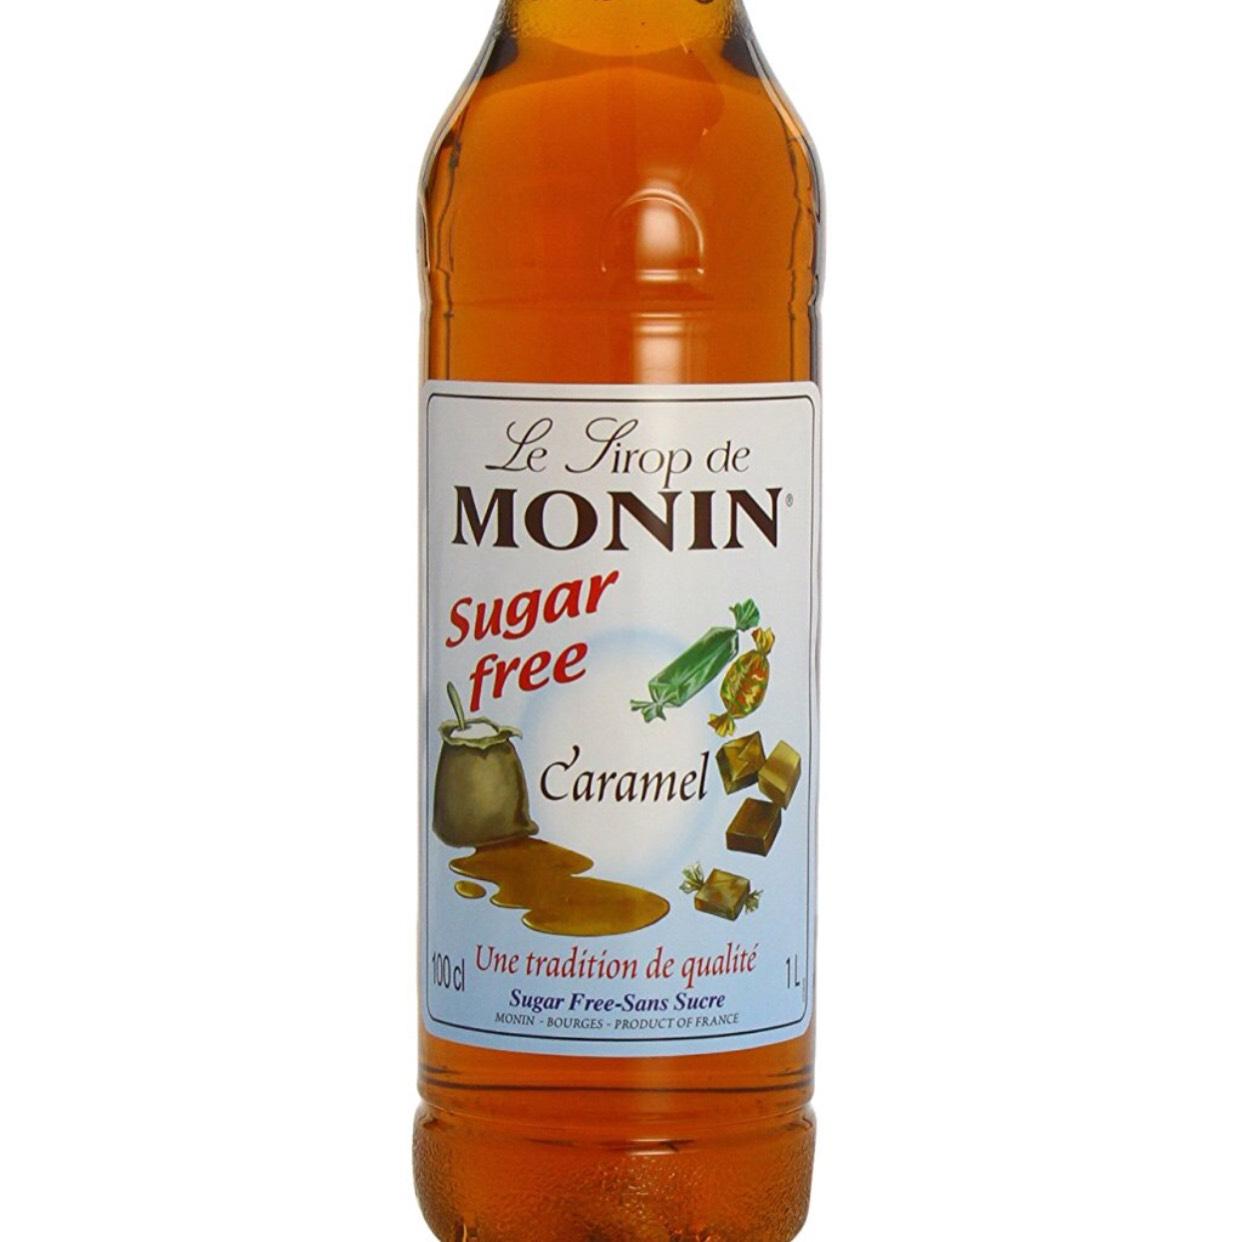 Monin Sugar Free 1ltr Caramel Syrup £8.00 (prime) @ Amazon